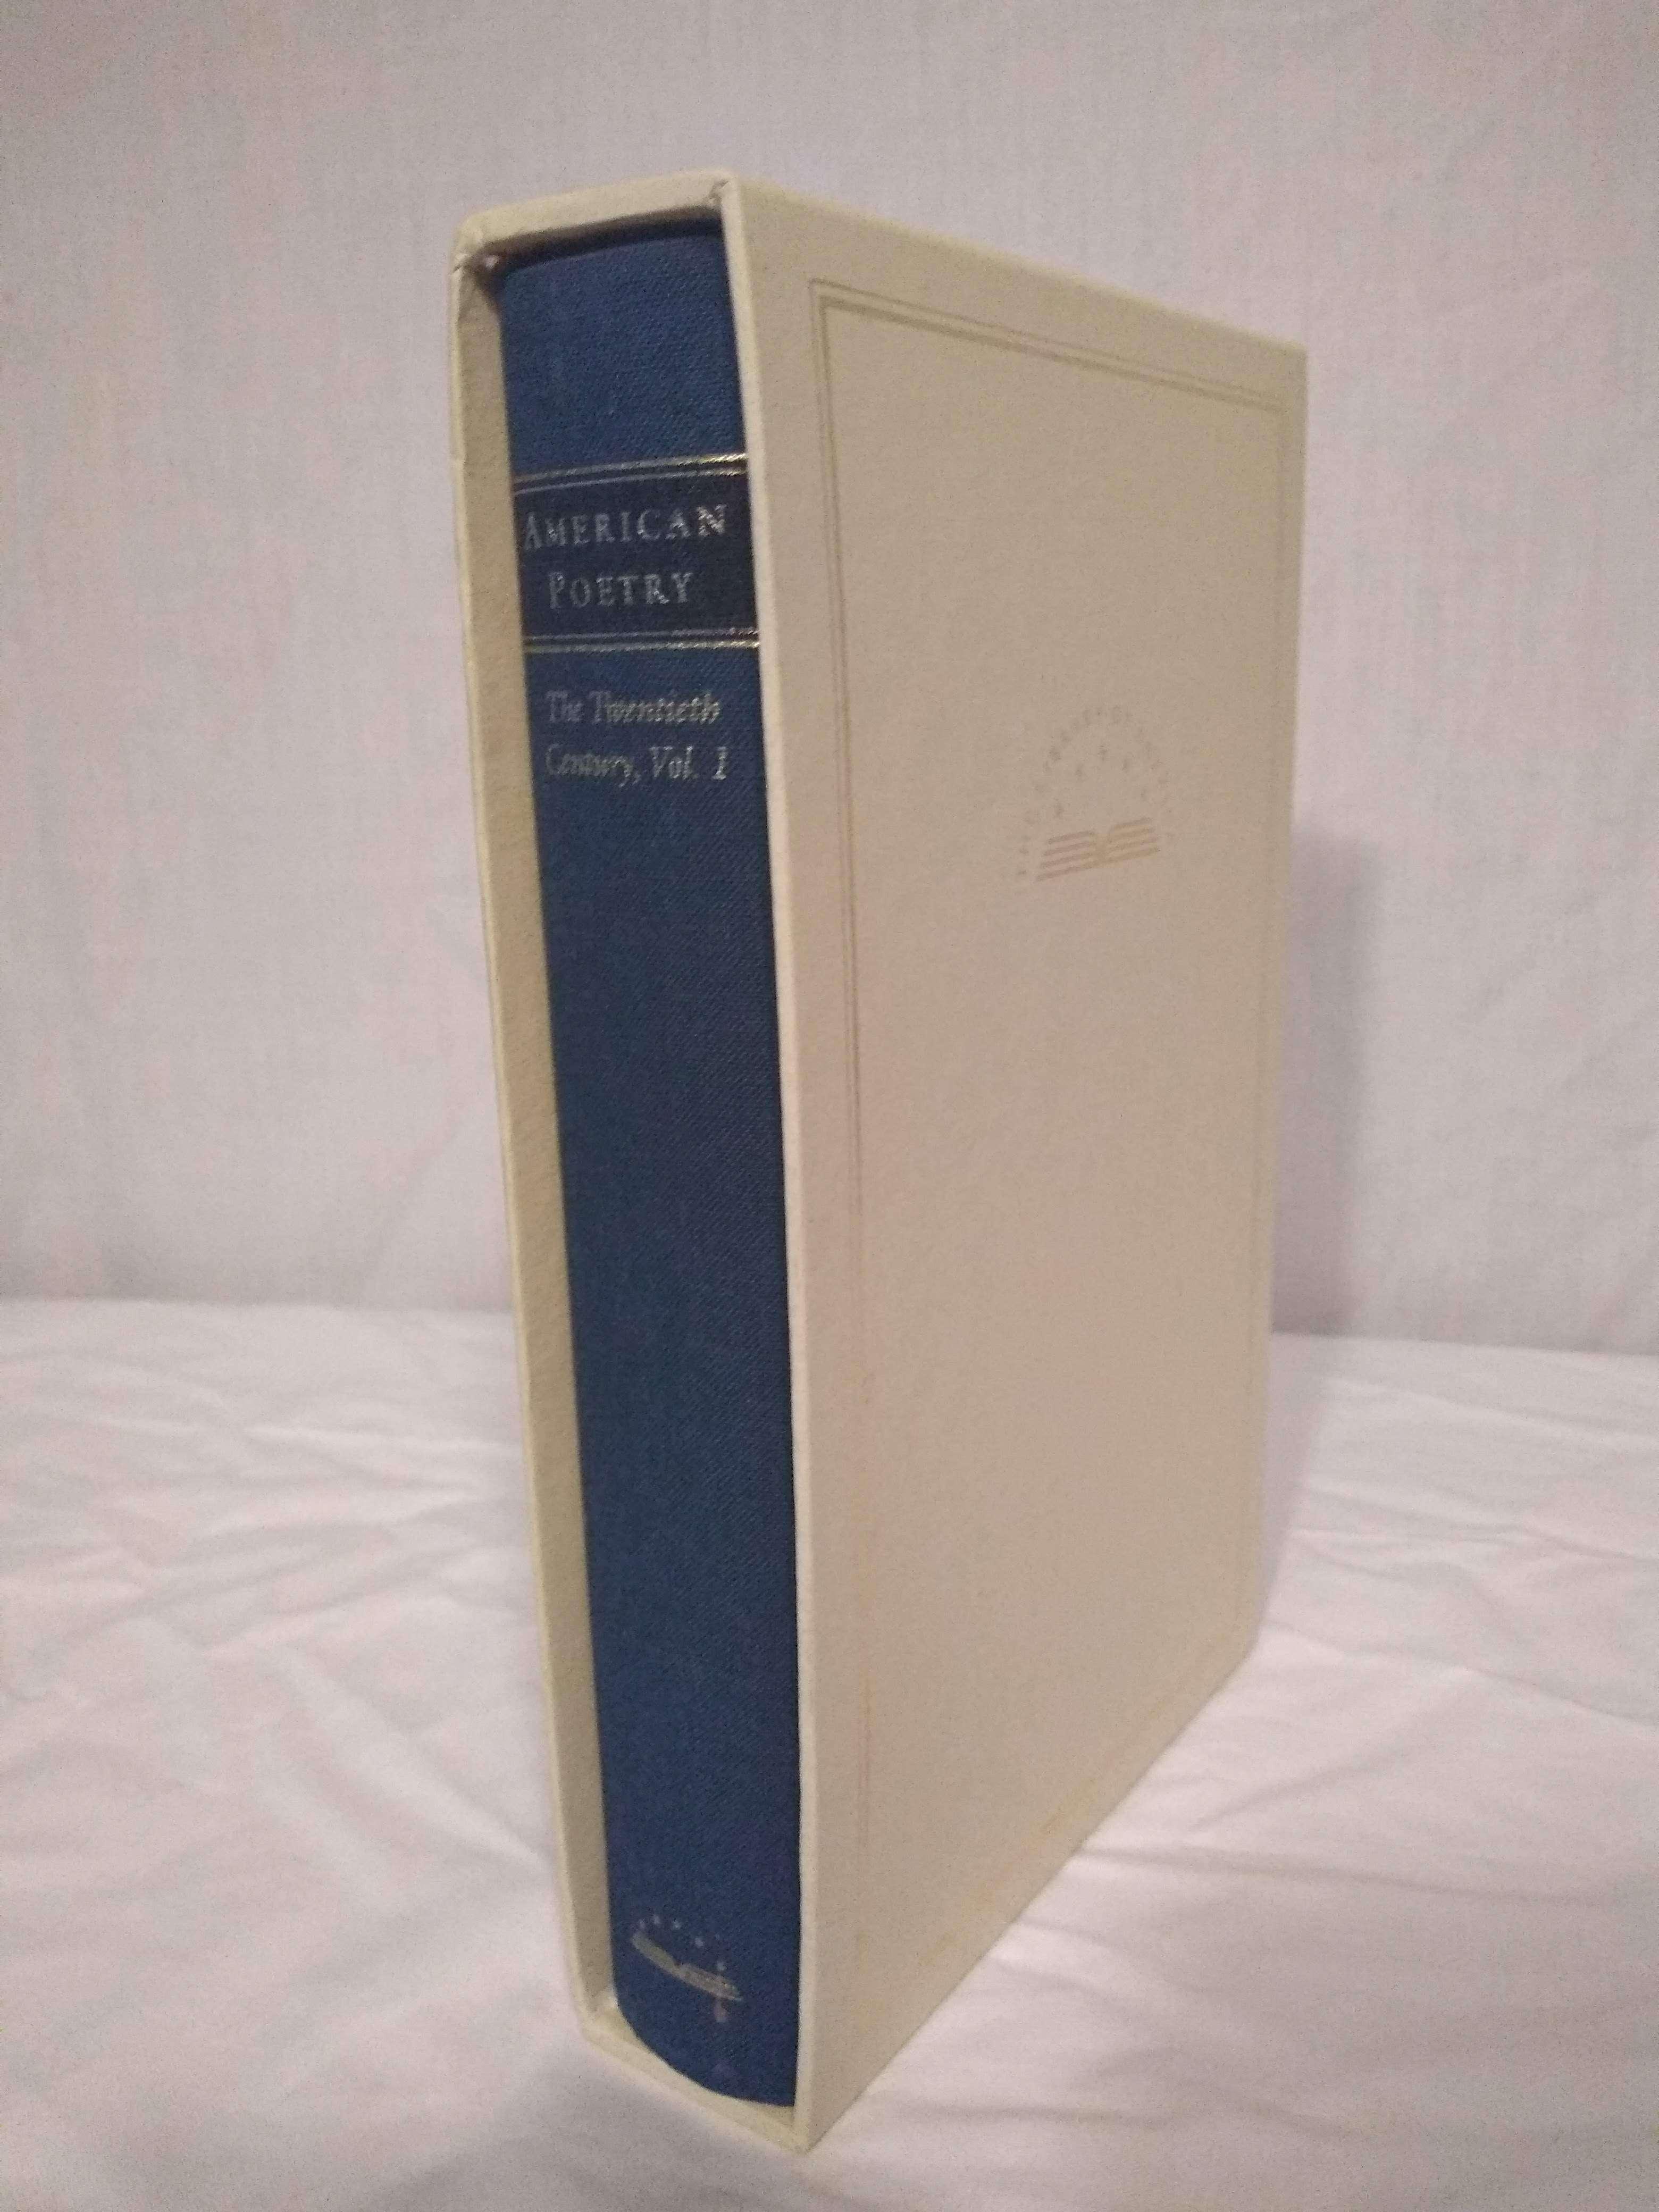 American Poetry : The Twentieth Century, Volume 1 : Henry Adams to Dorothy Parker